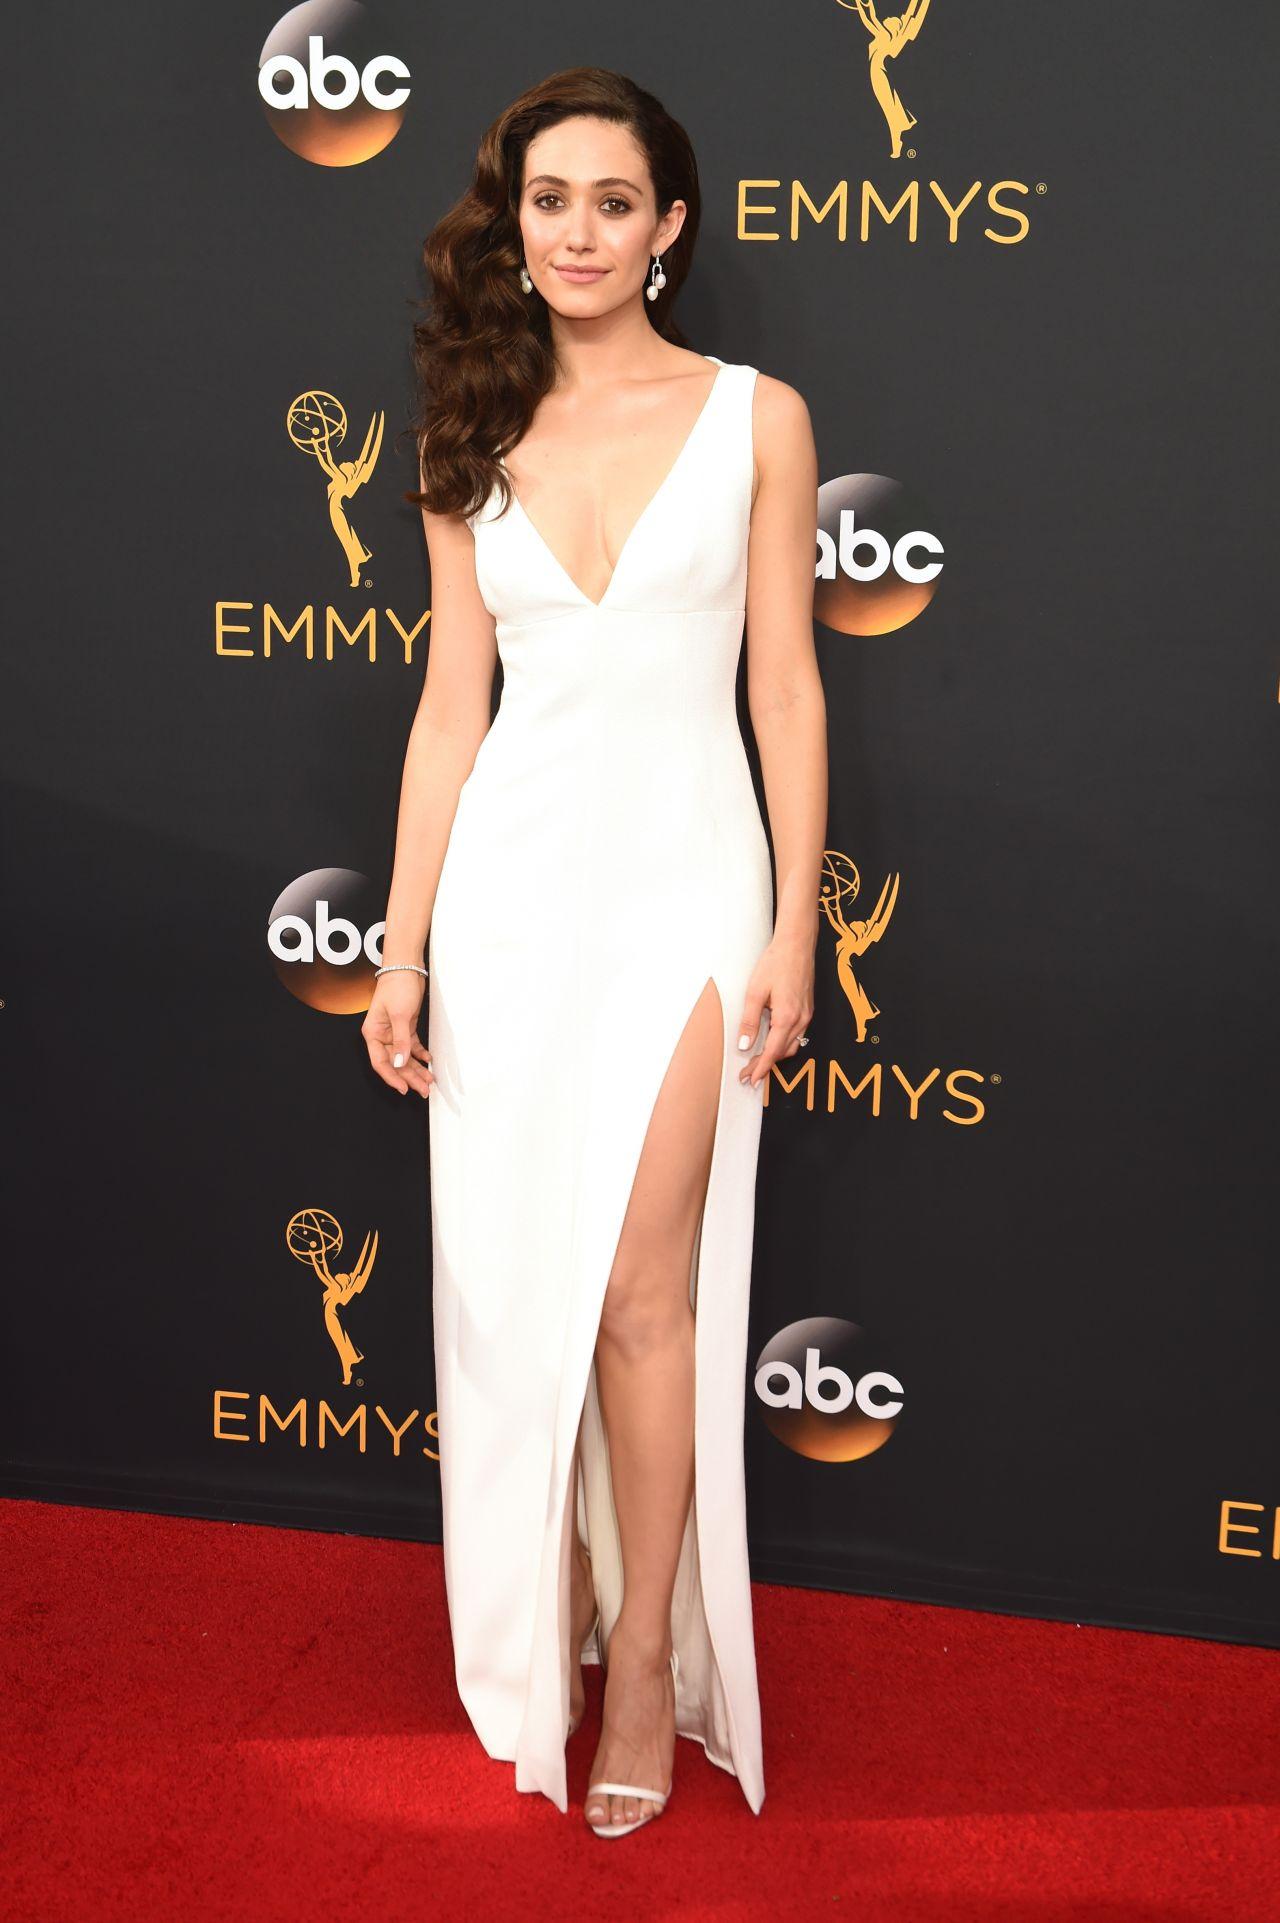 Emmy Rossum 68th Annual Emmy Awards In Los Angeles 09 18